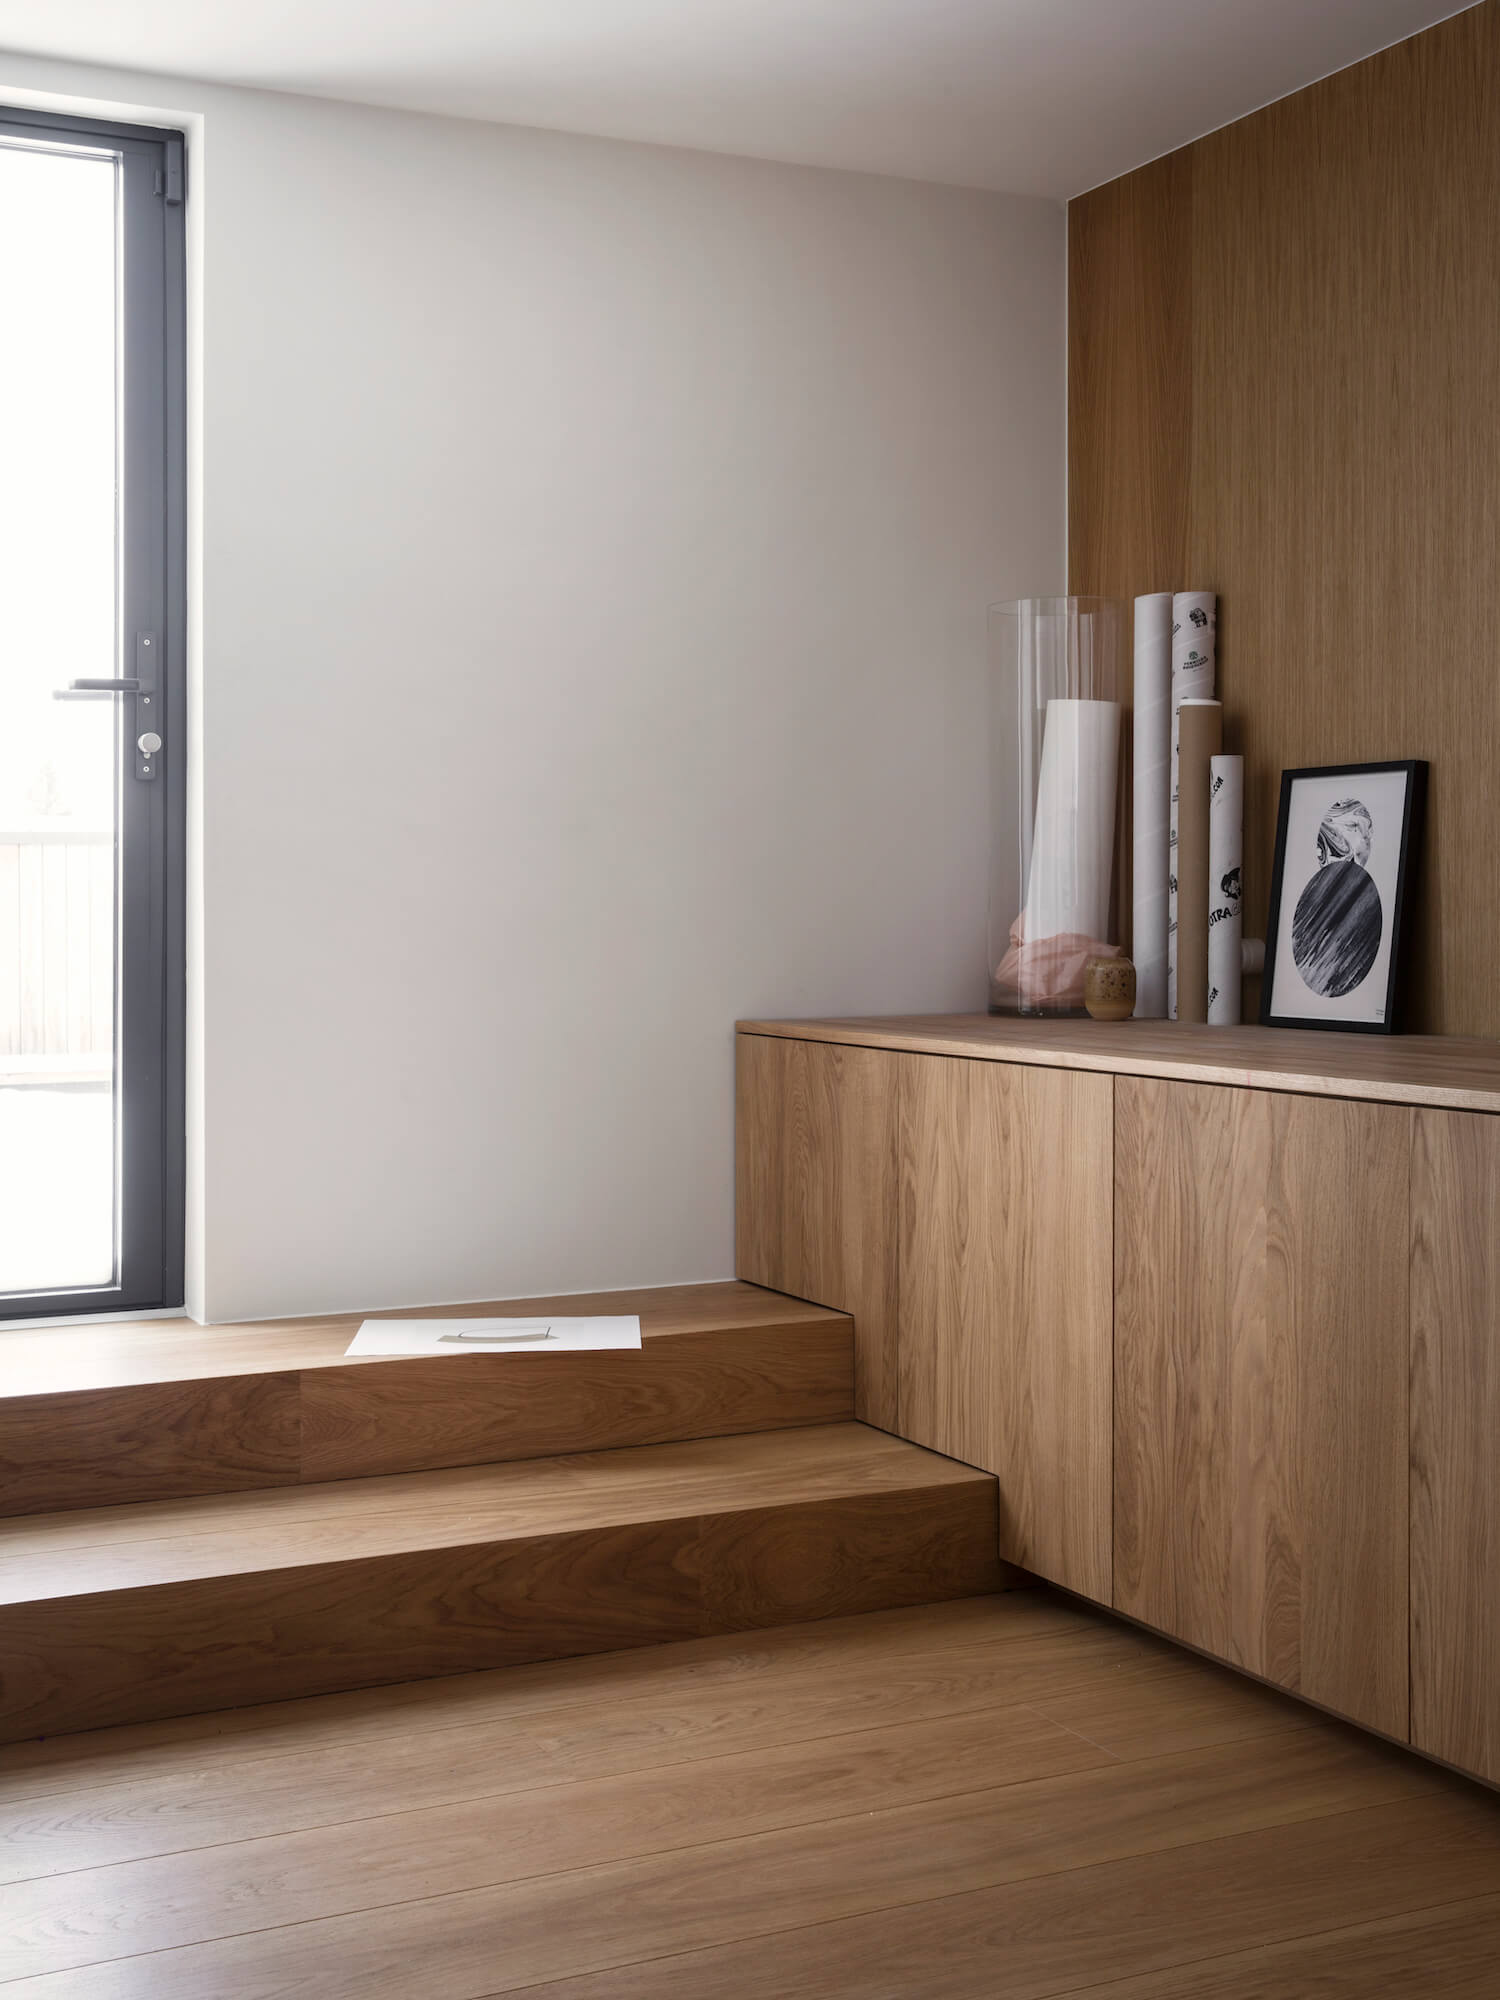 est living gjoevik house norm architects 6